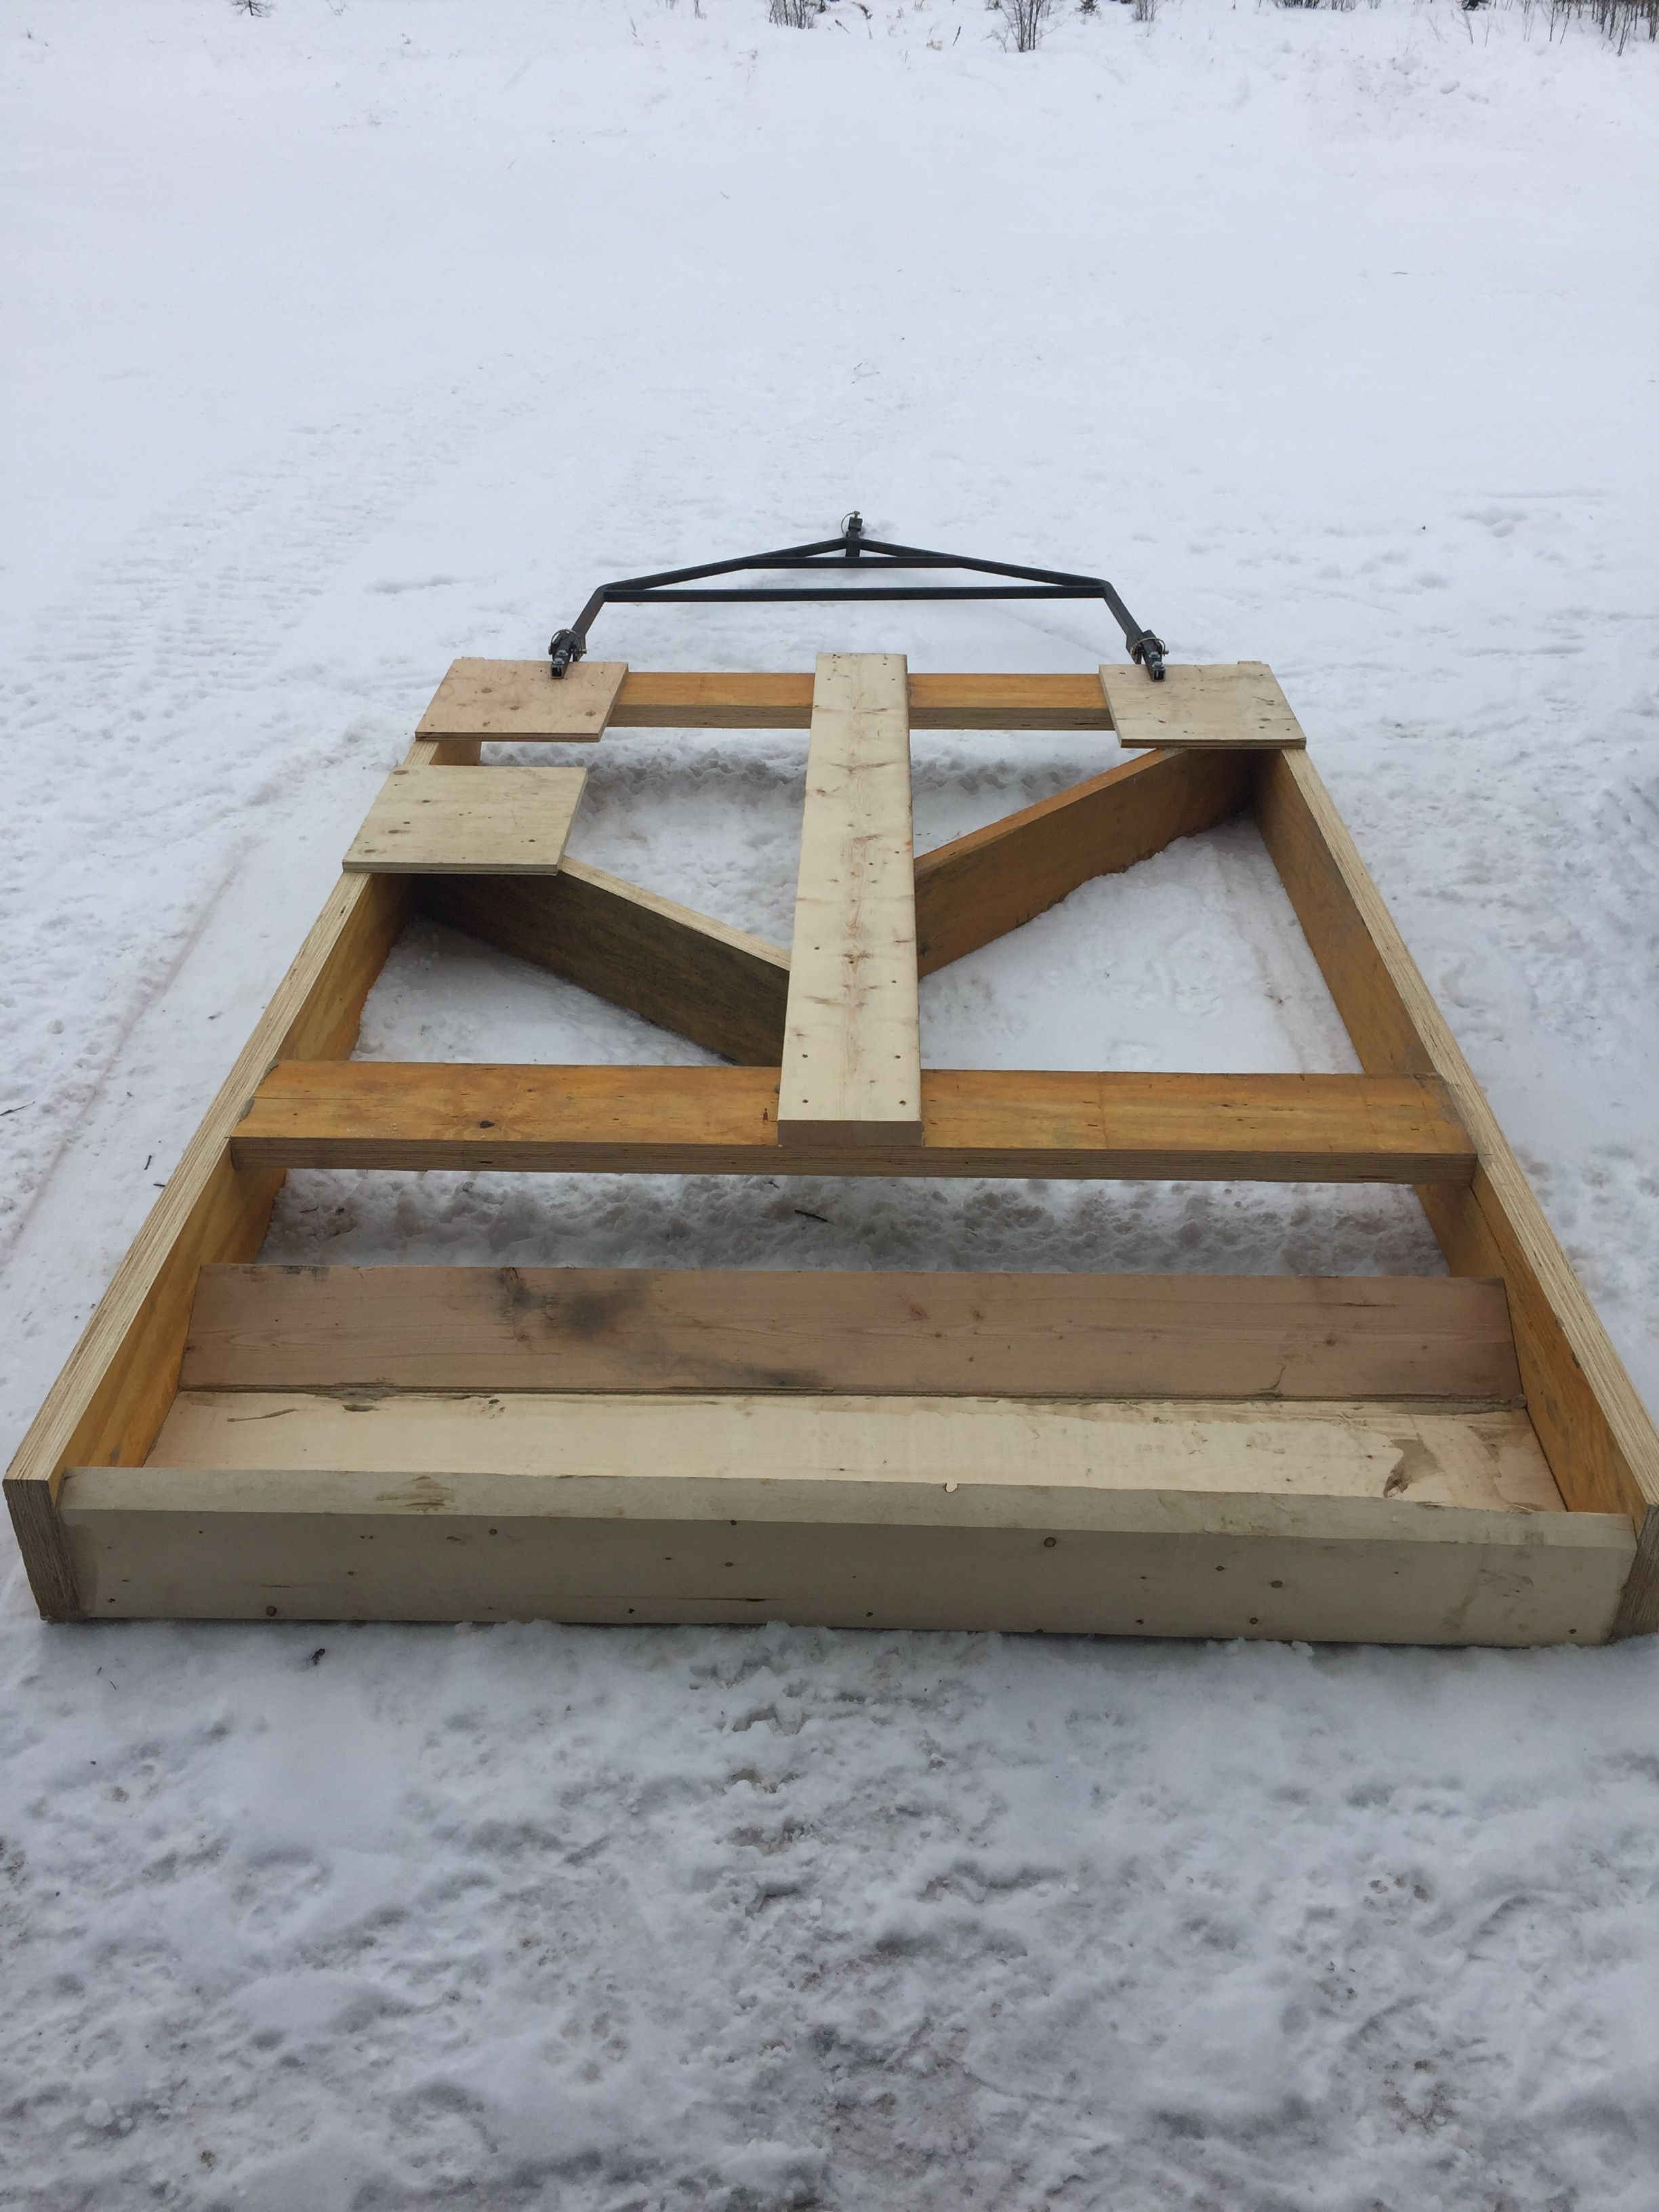 Grooming Snowmobiles - Cross Country Skier  Cross Country Ski Trail Grooming